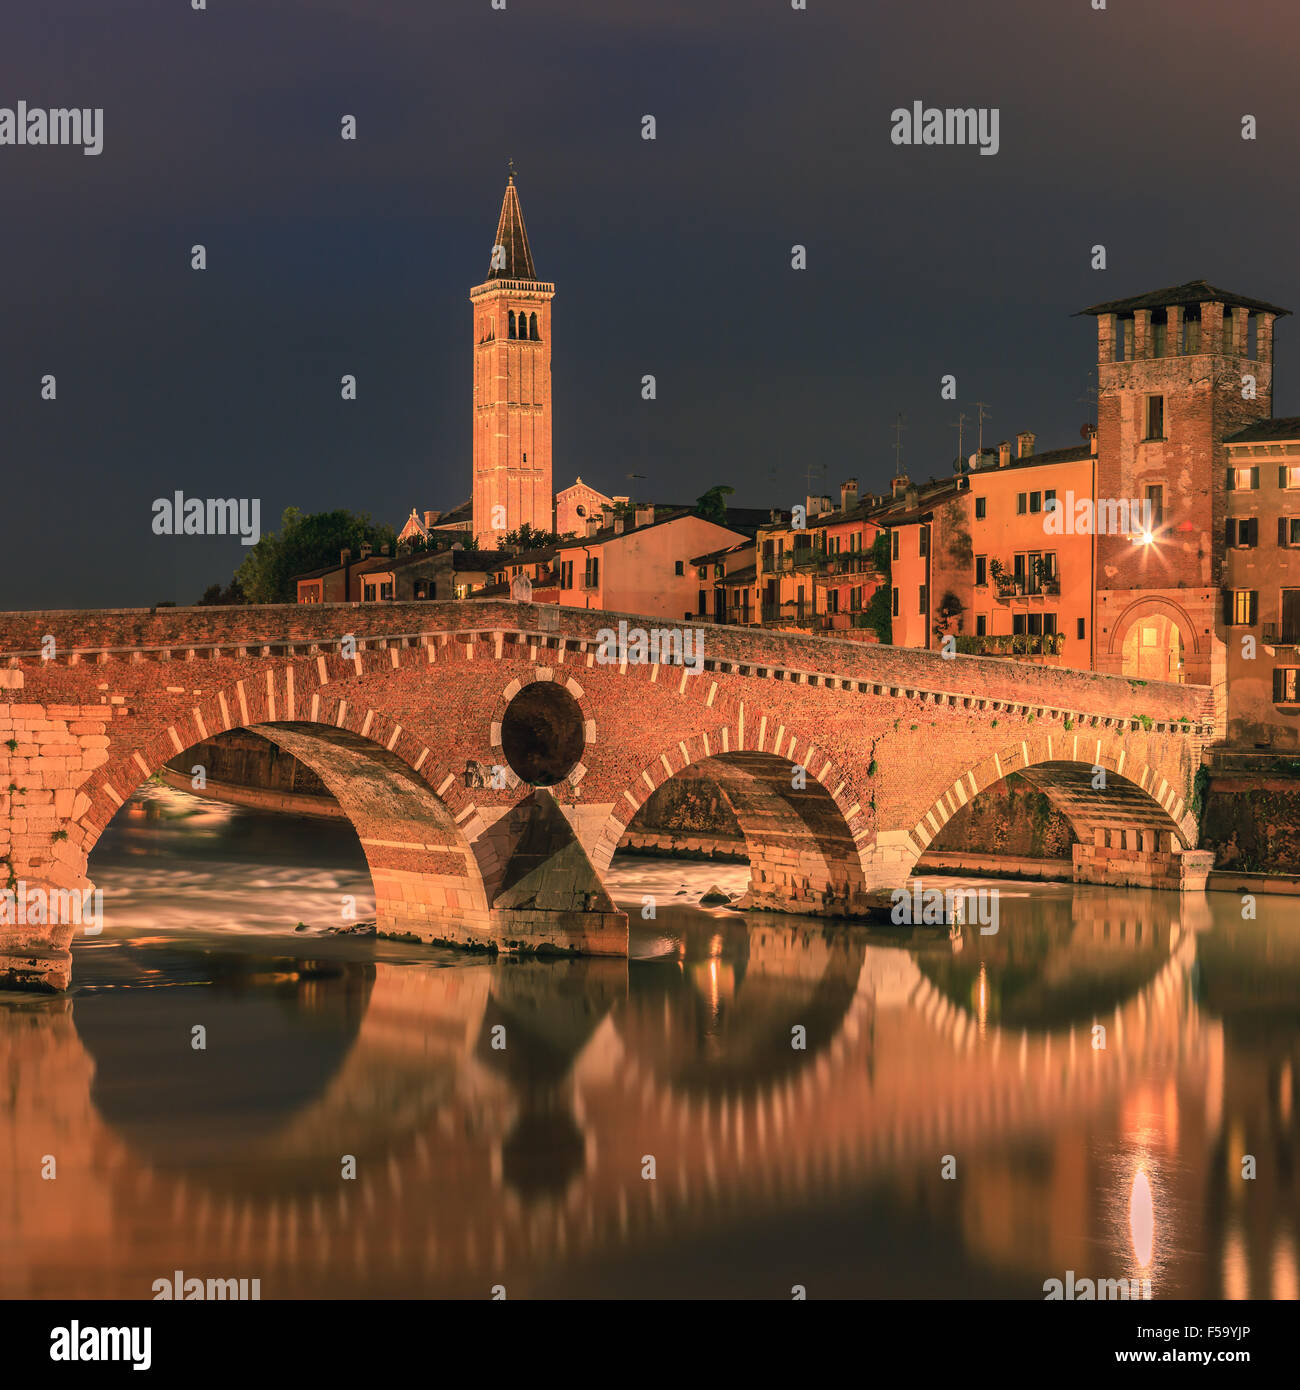 Ponte Pietra bridge at dusk over the Adige river in Verona, Italy - Stock Image